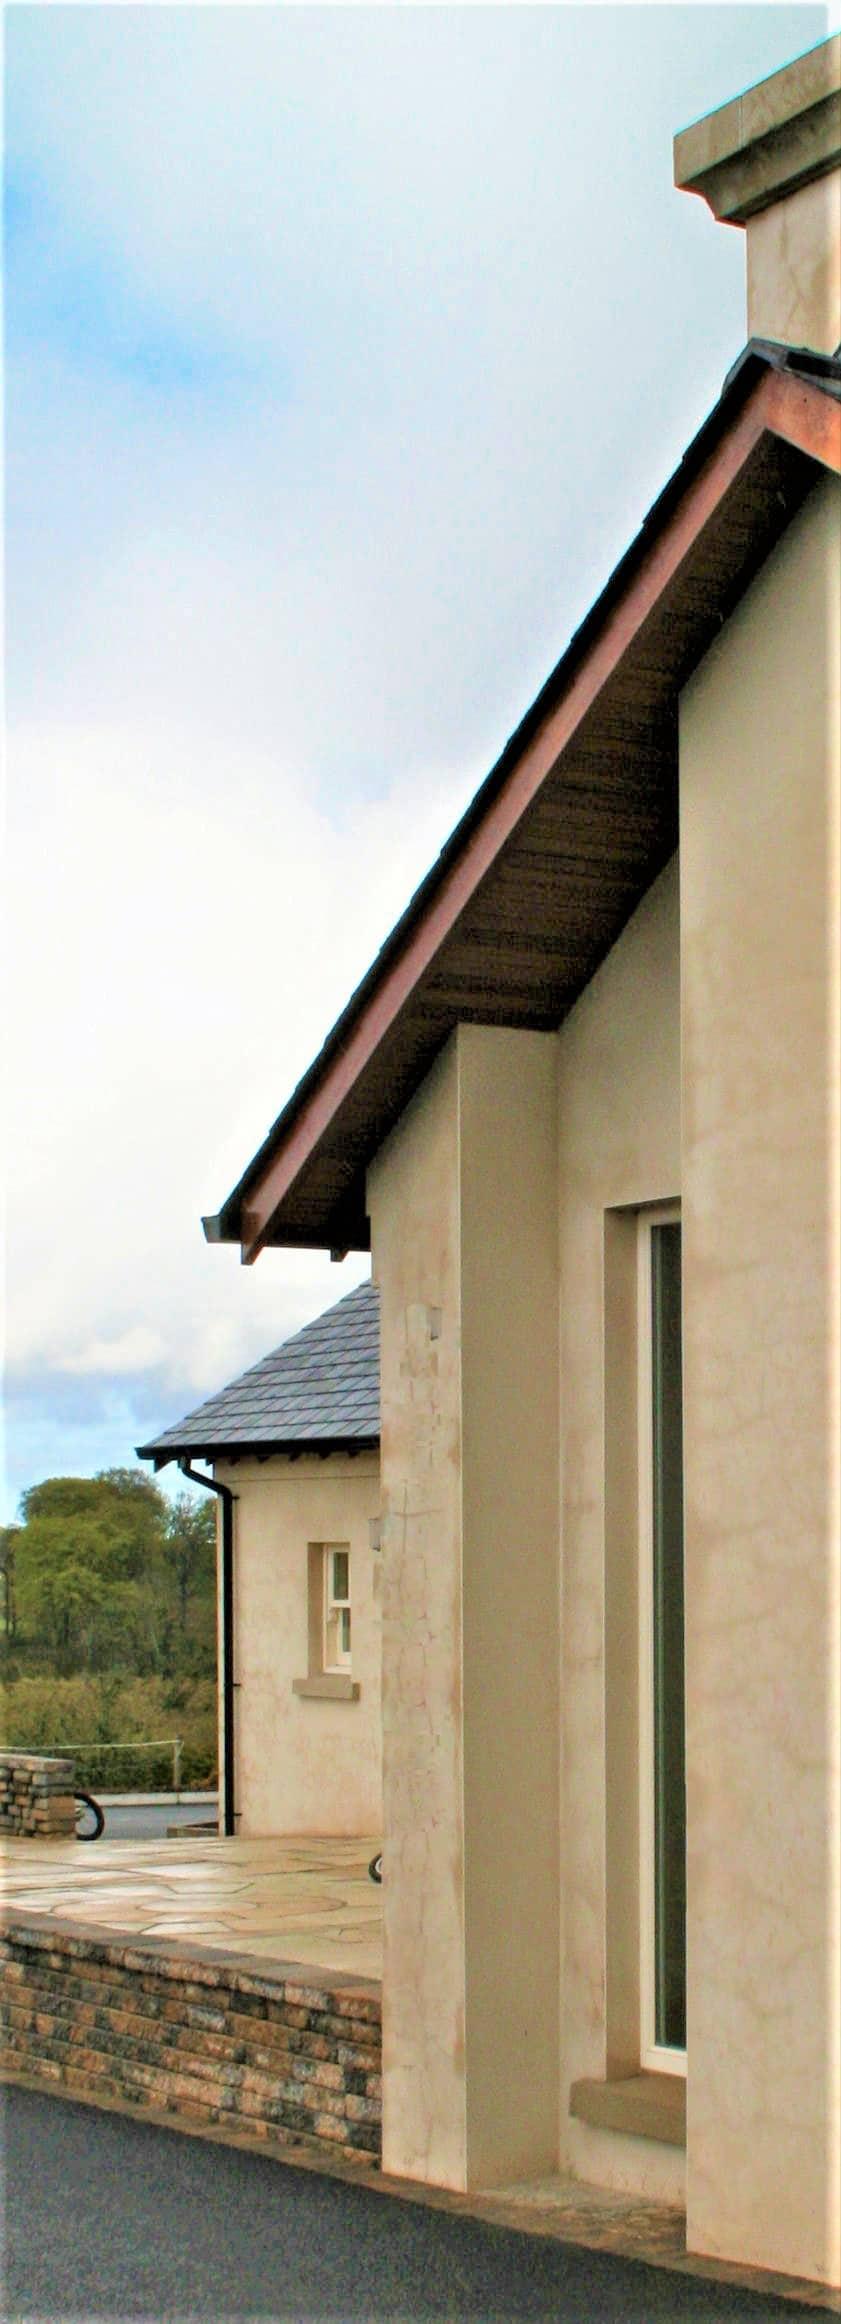 Killmartin - Roof Detailing